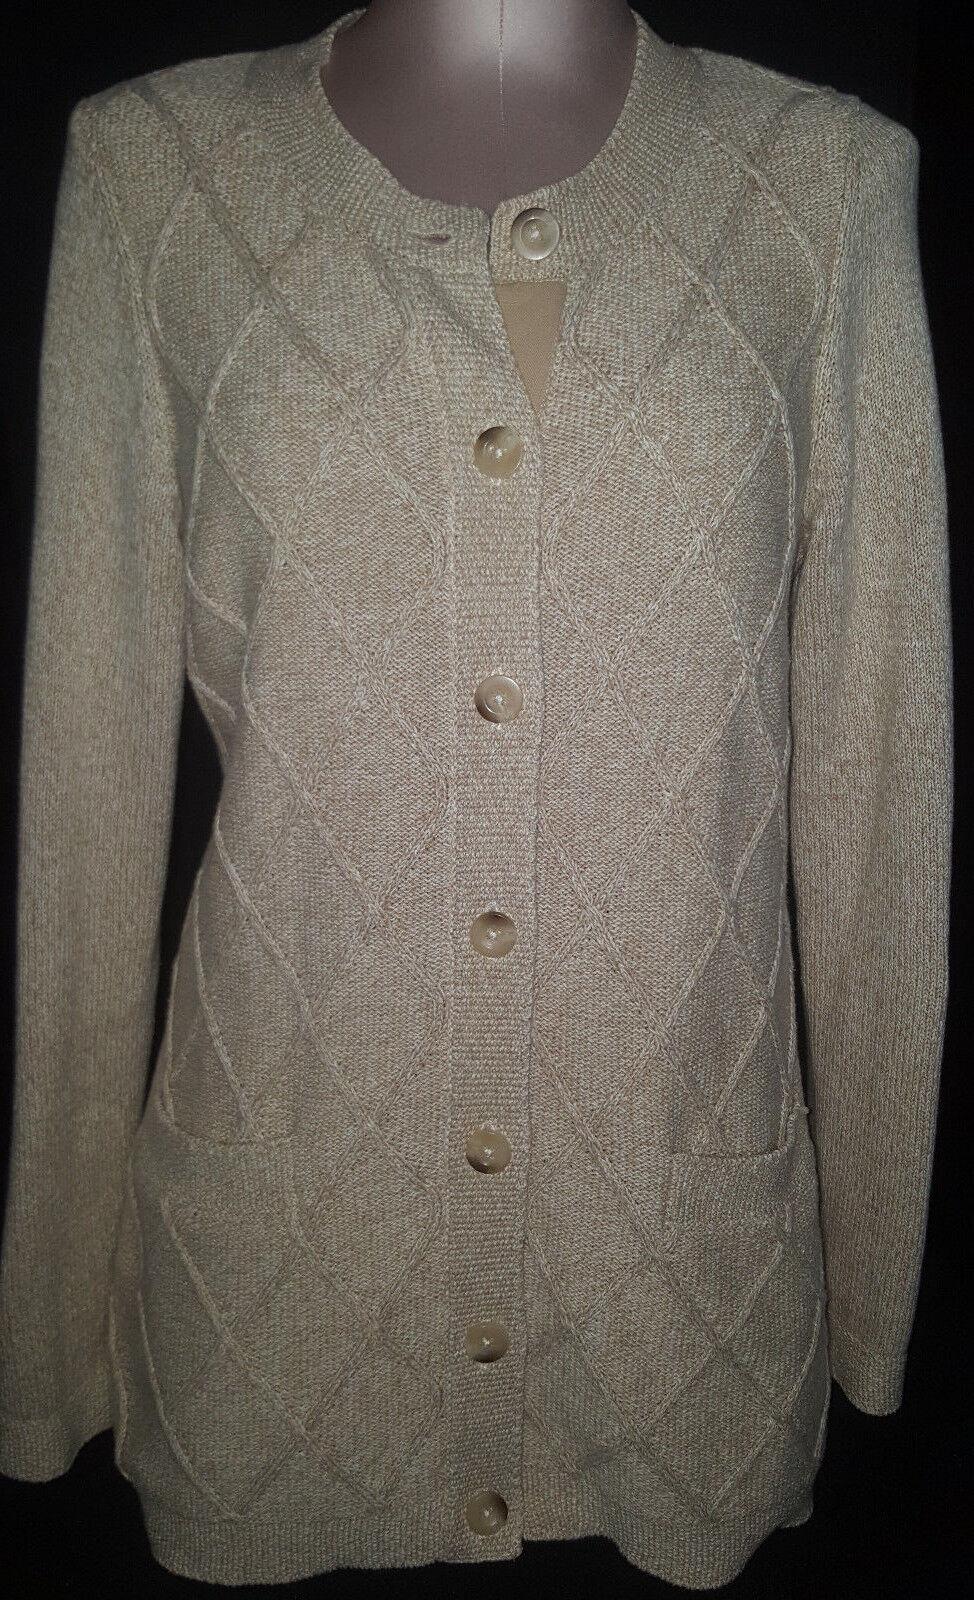 L.L. BEAN Womens Button Front Cardigan Sweater Size Medium Beige Cotton